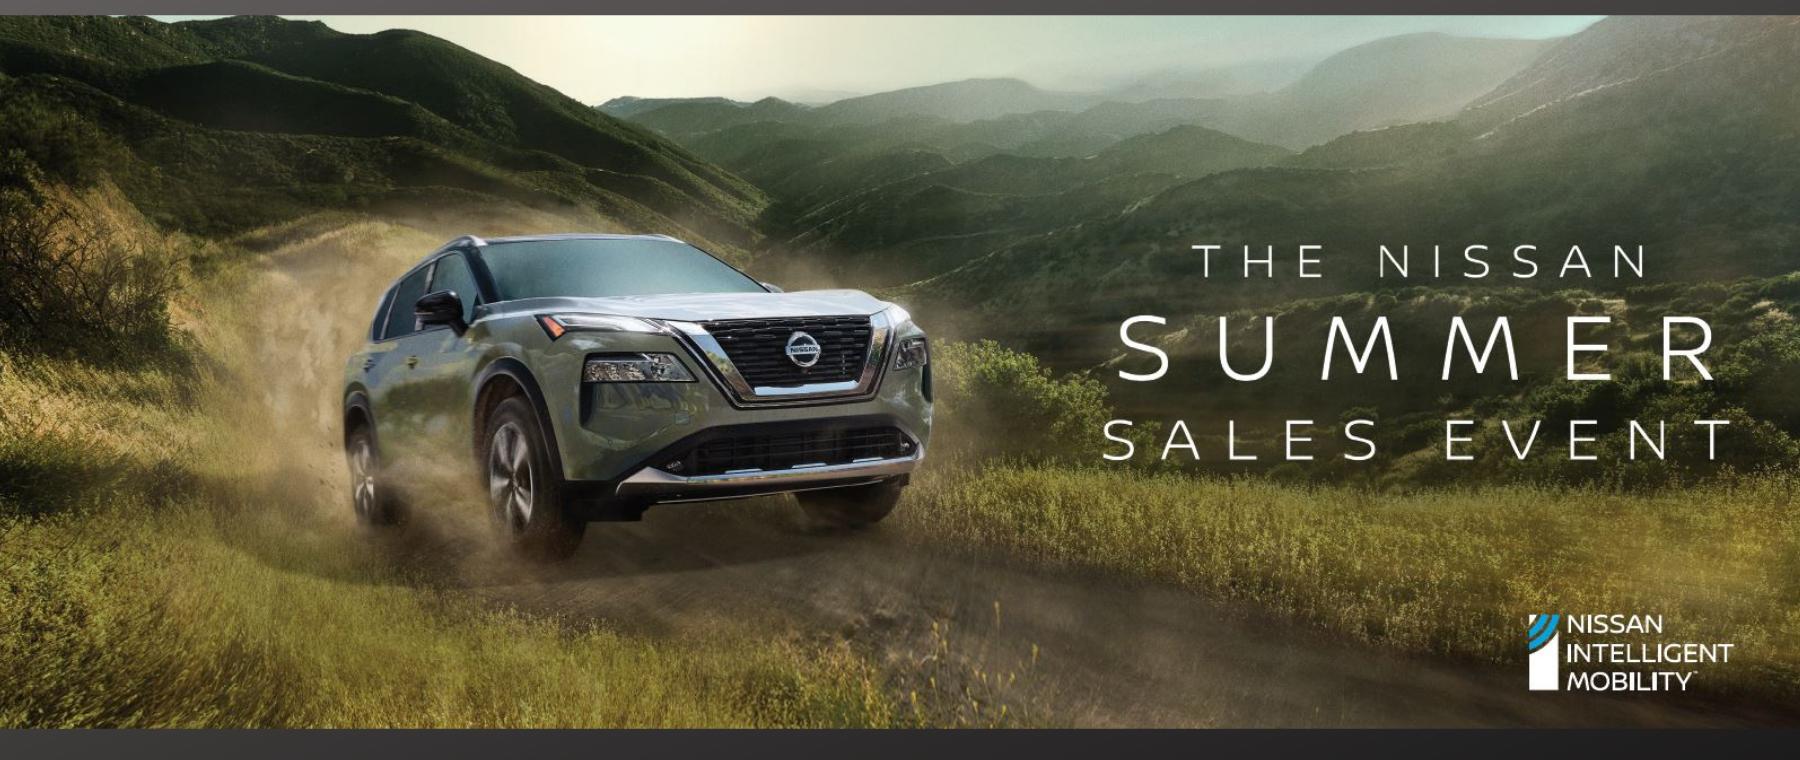 summer sales event June 21